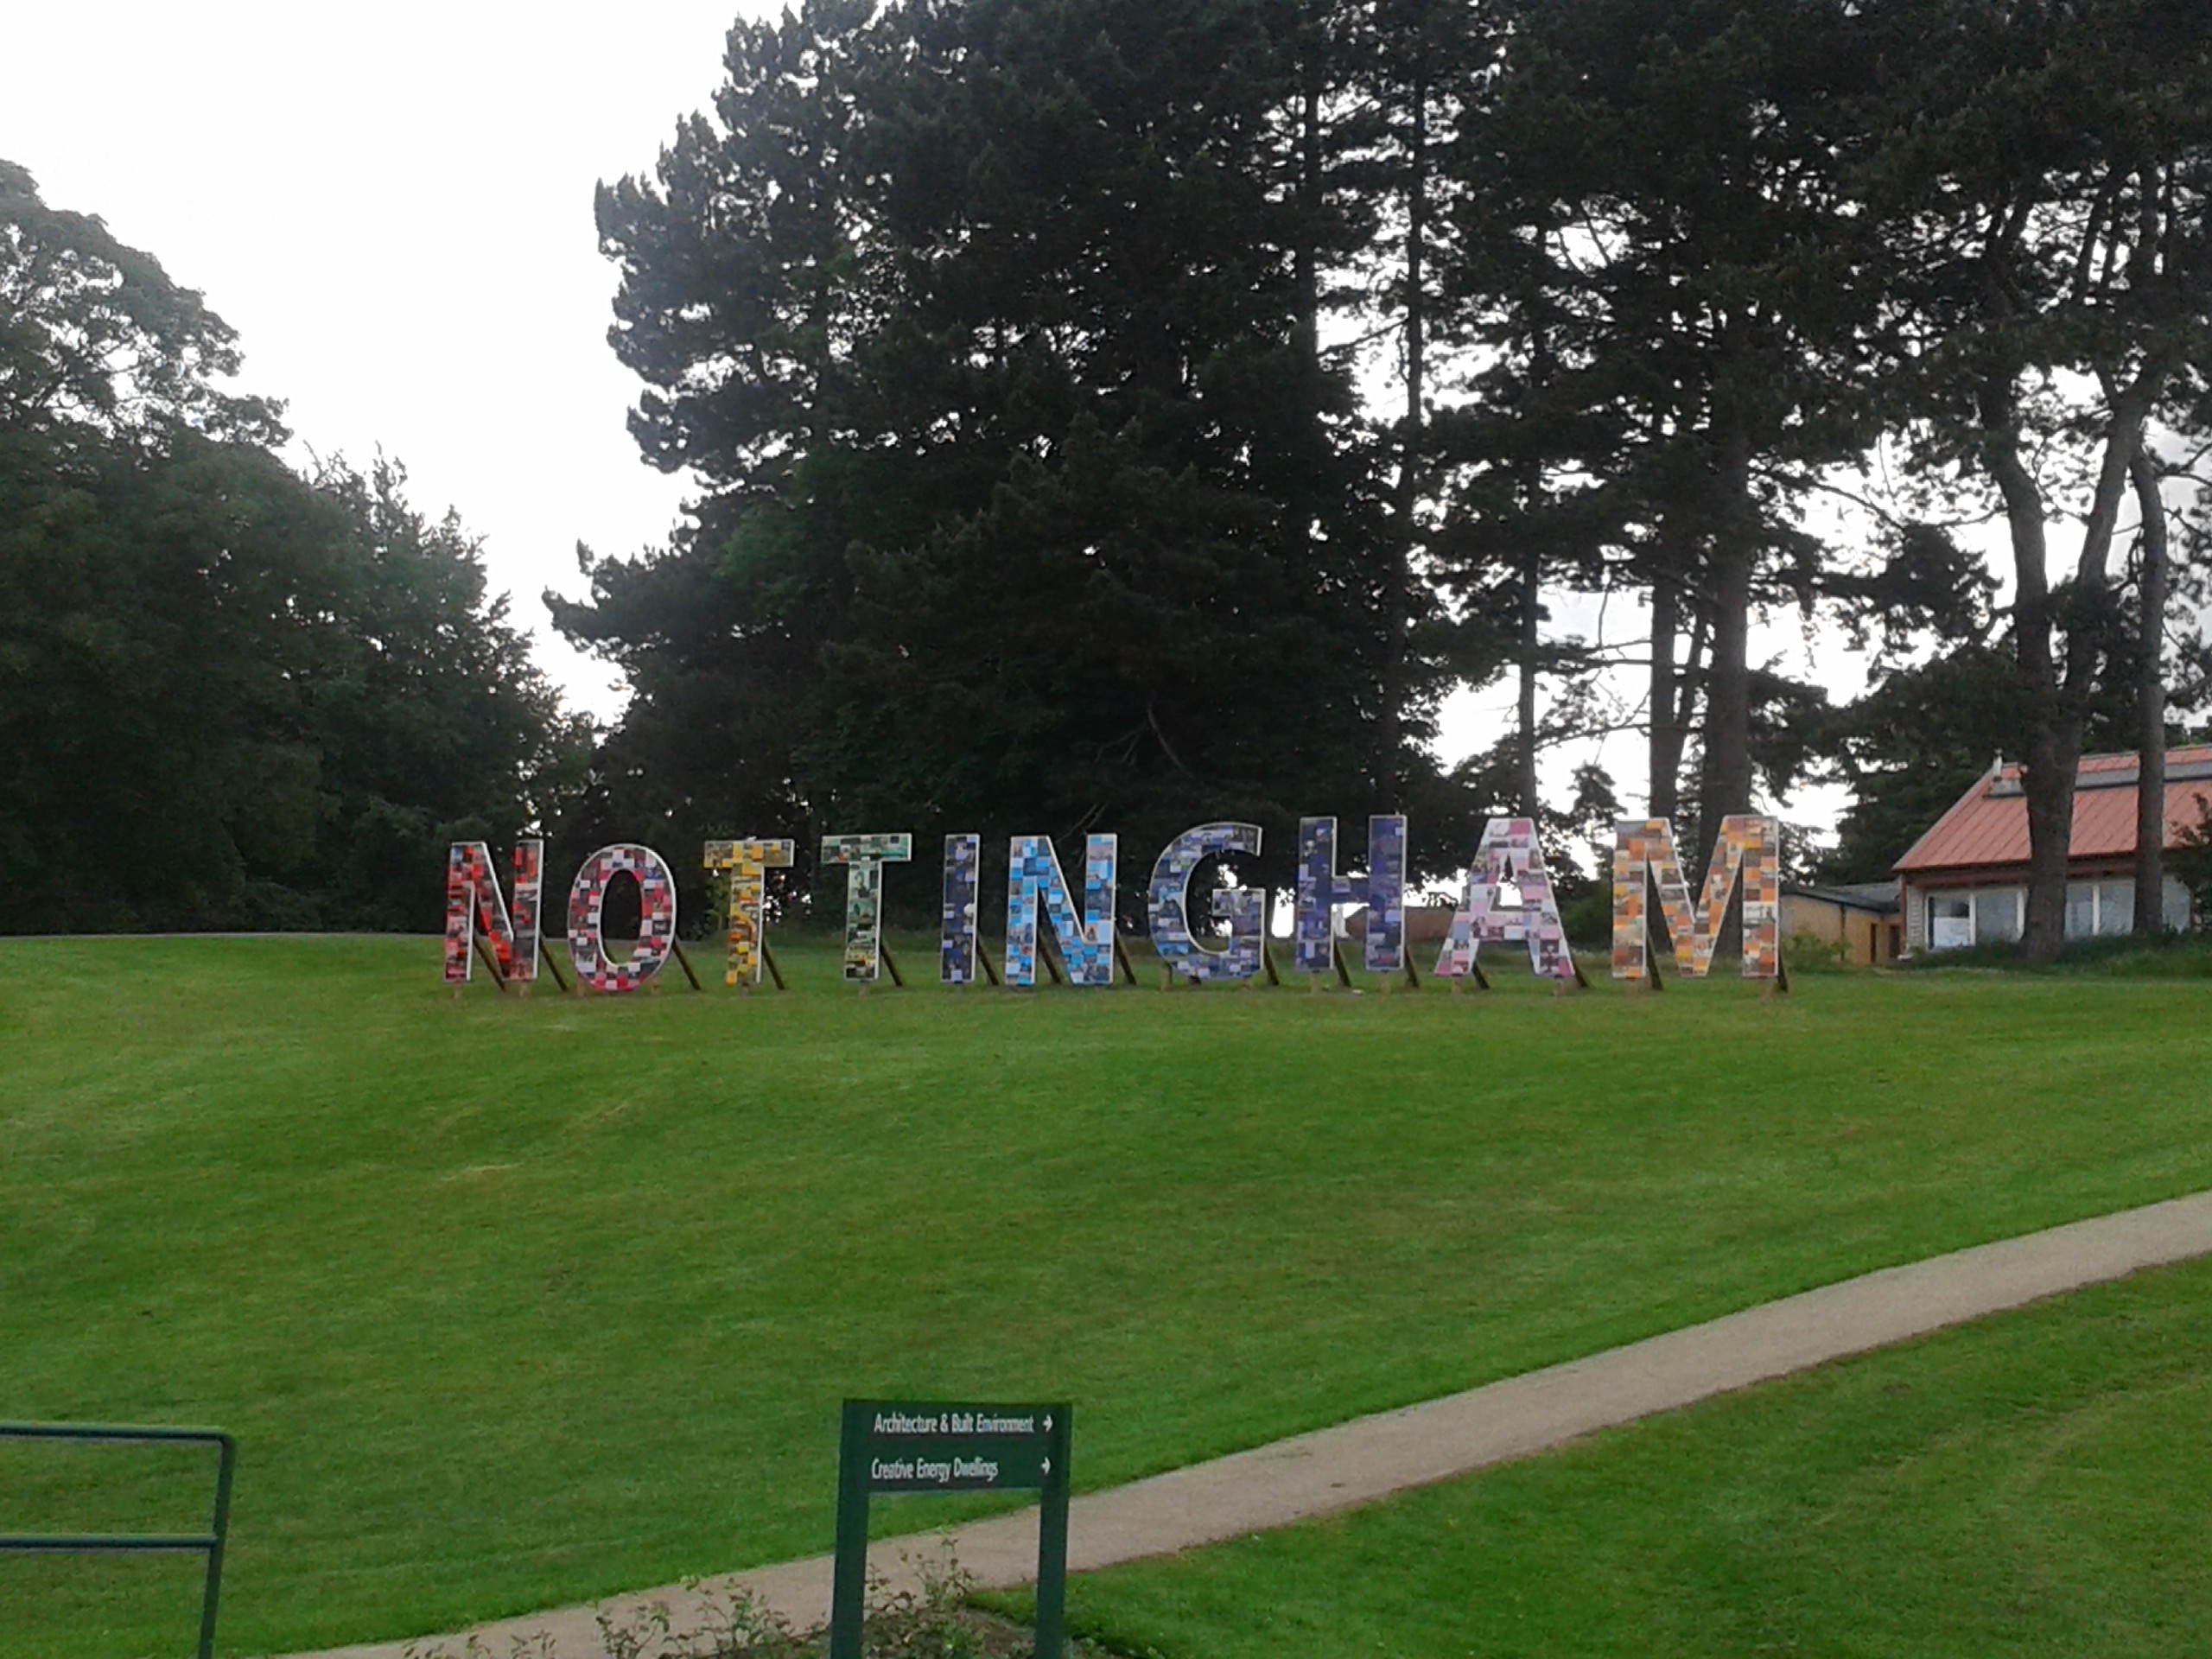 Nottingham sign at University Park Campus, Nottingham | Todd's Travels Travel Blog